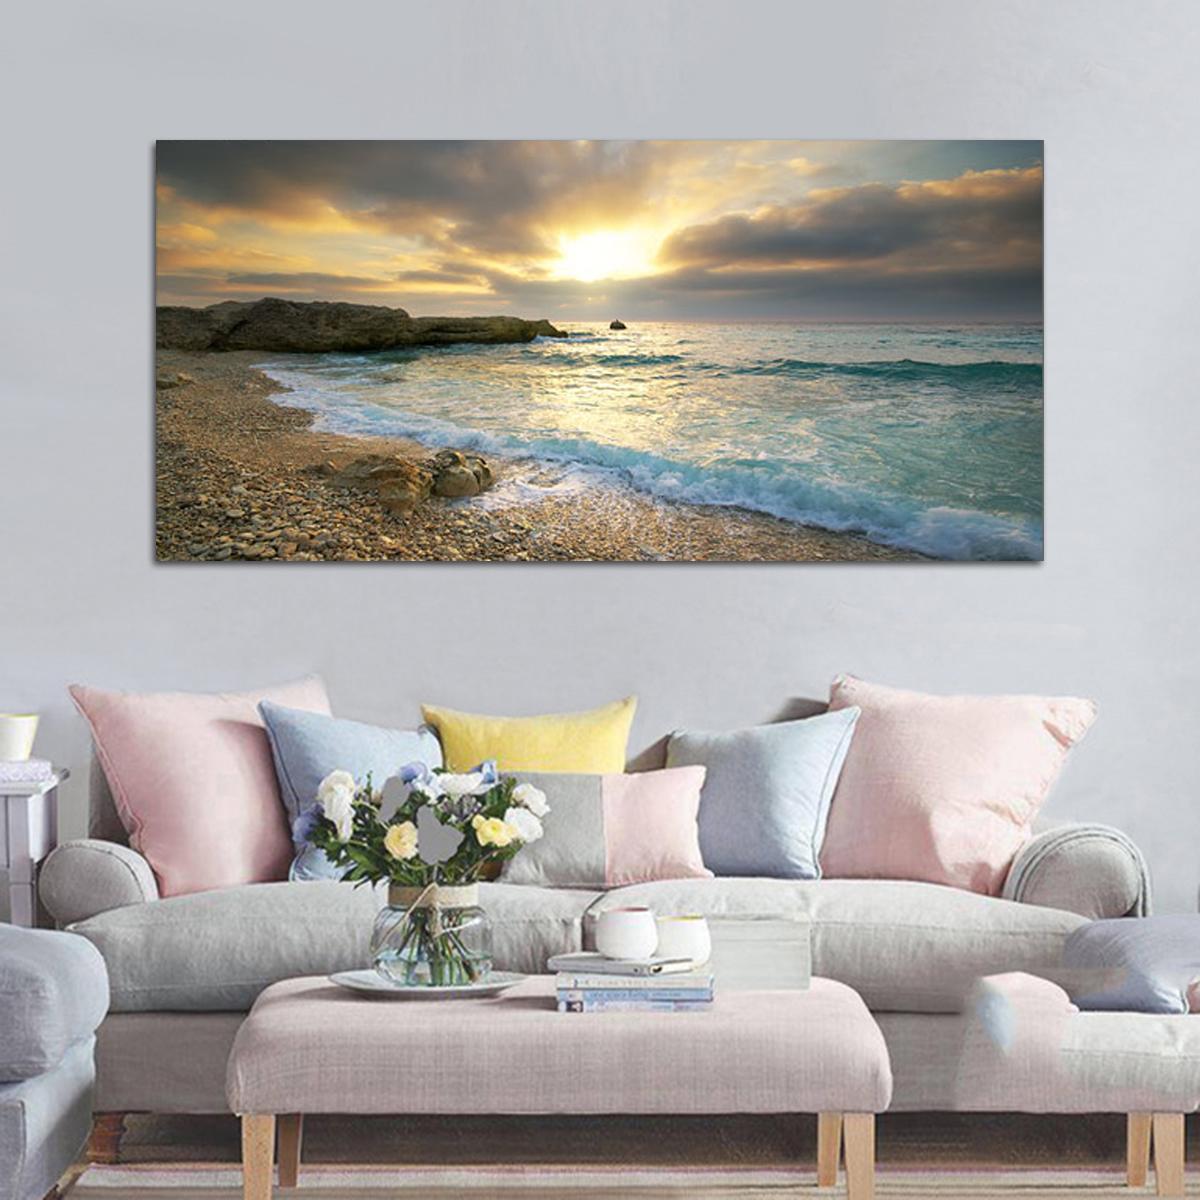 Beach Canvas Print Ocean Wave Sunset Sea No Frame ...